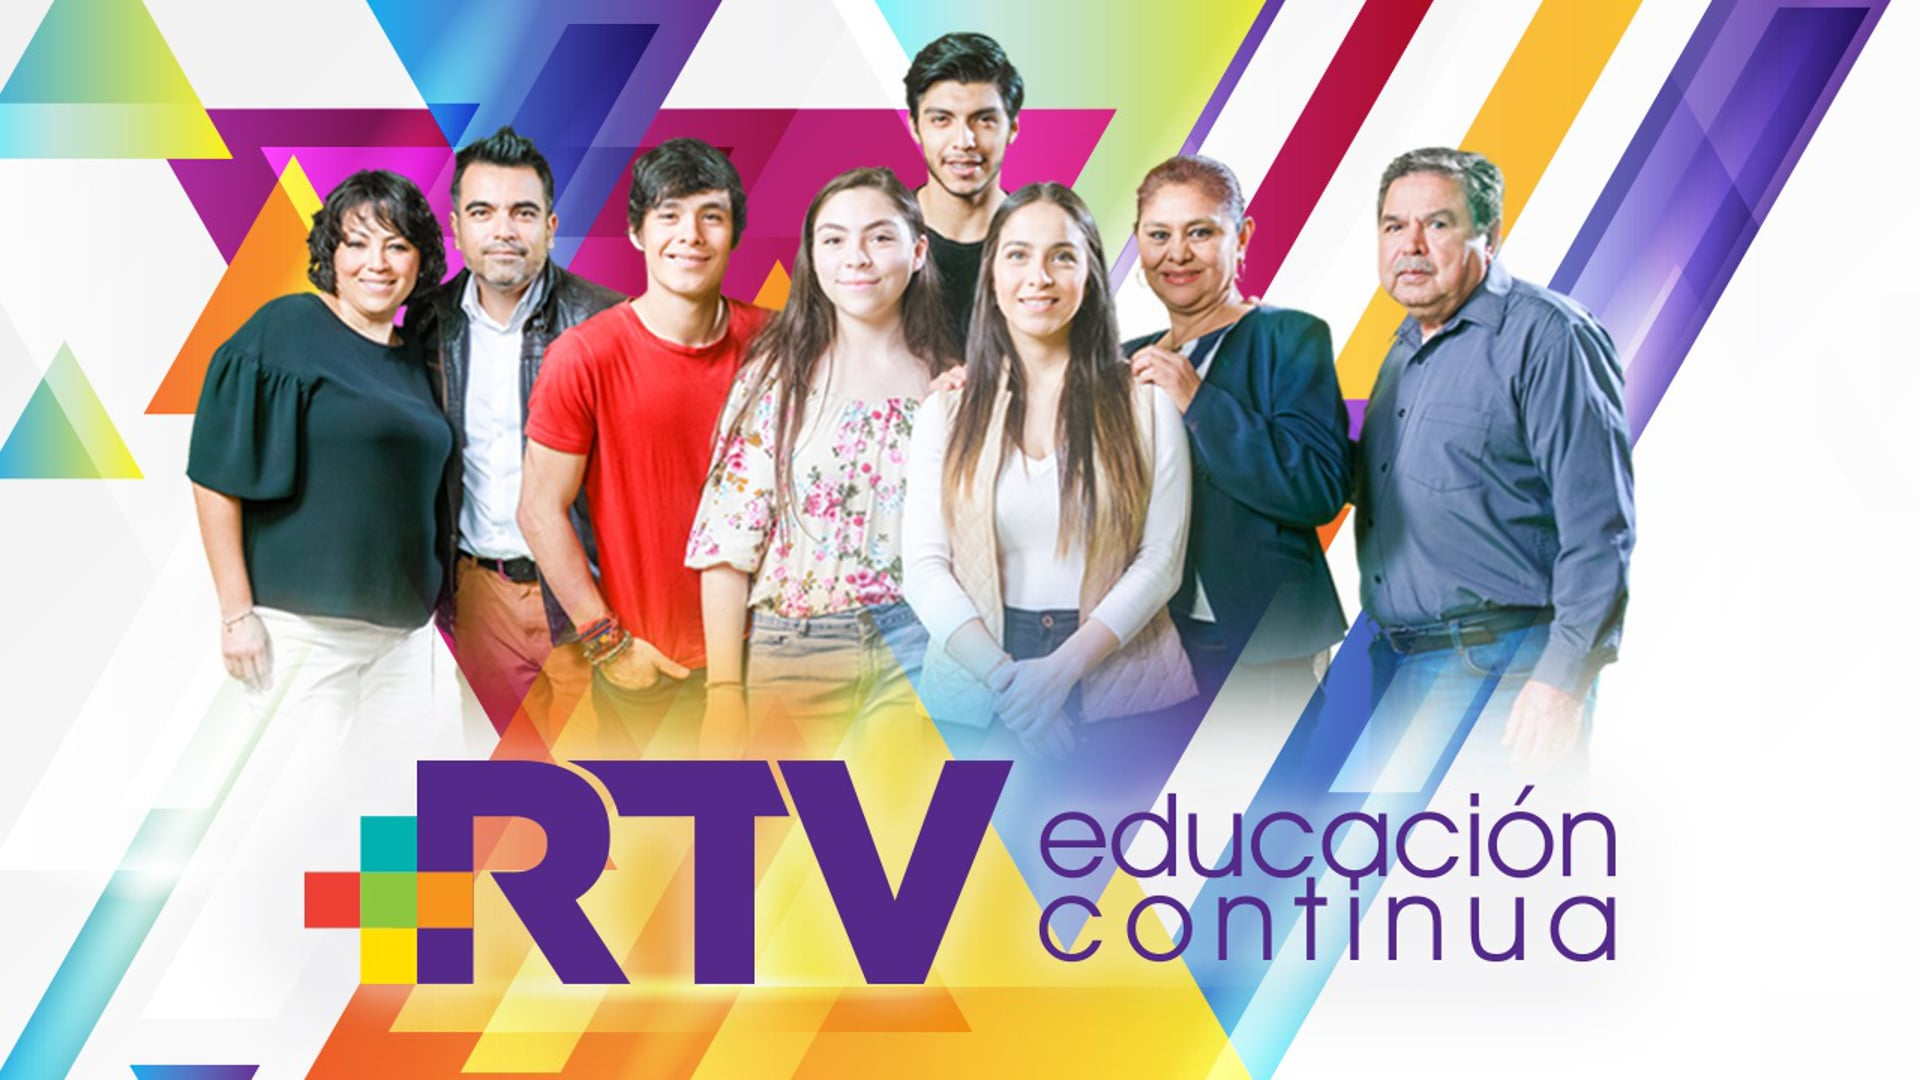 RTV Educación Continua